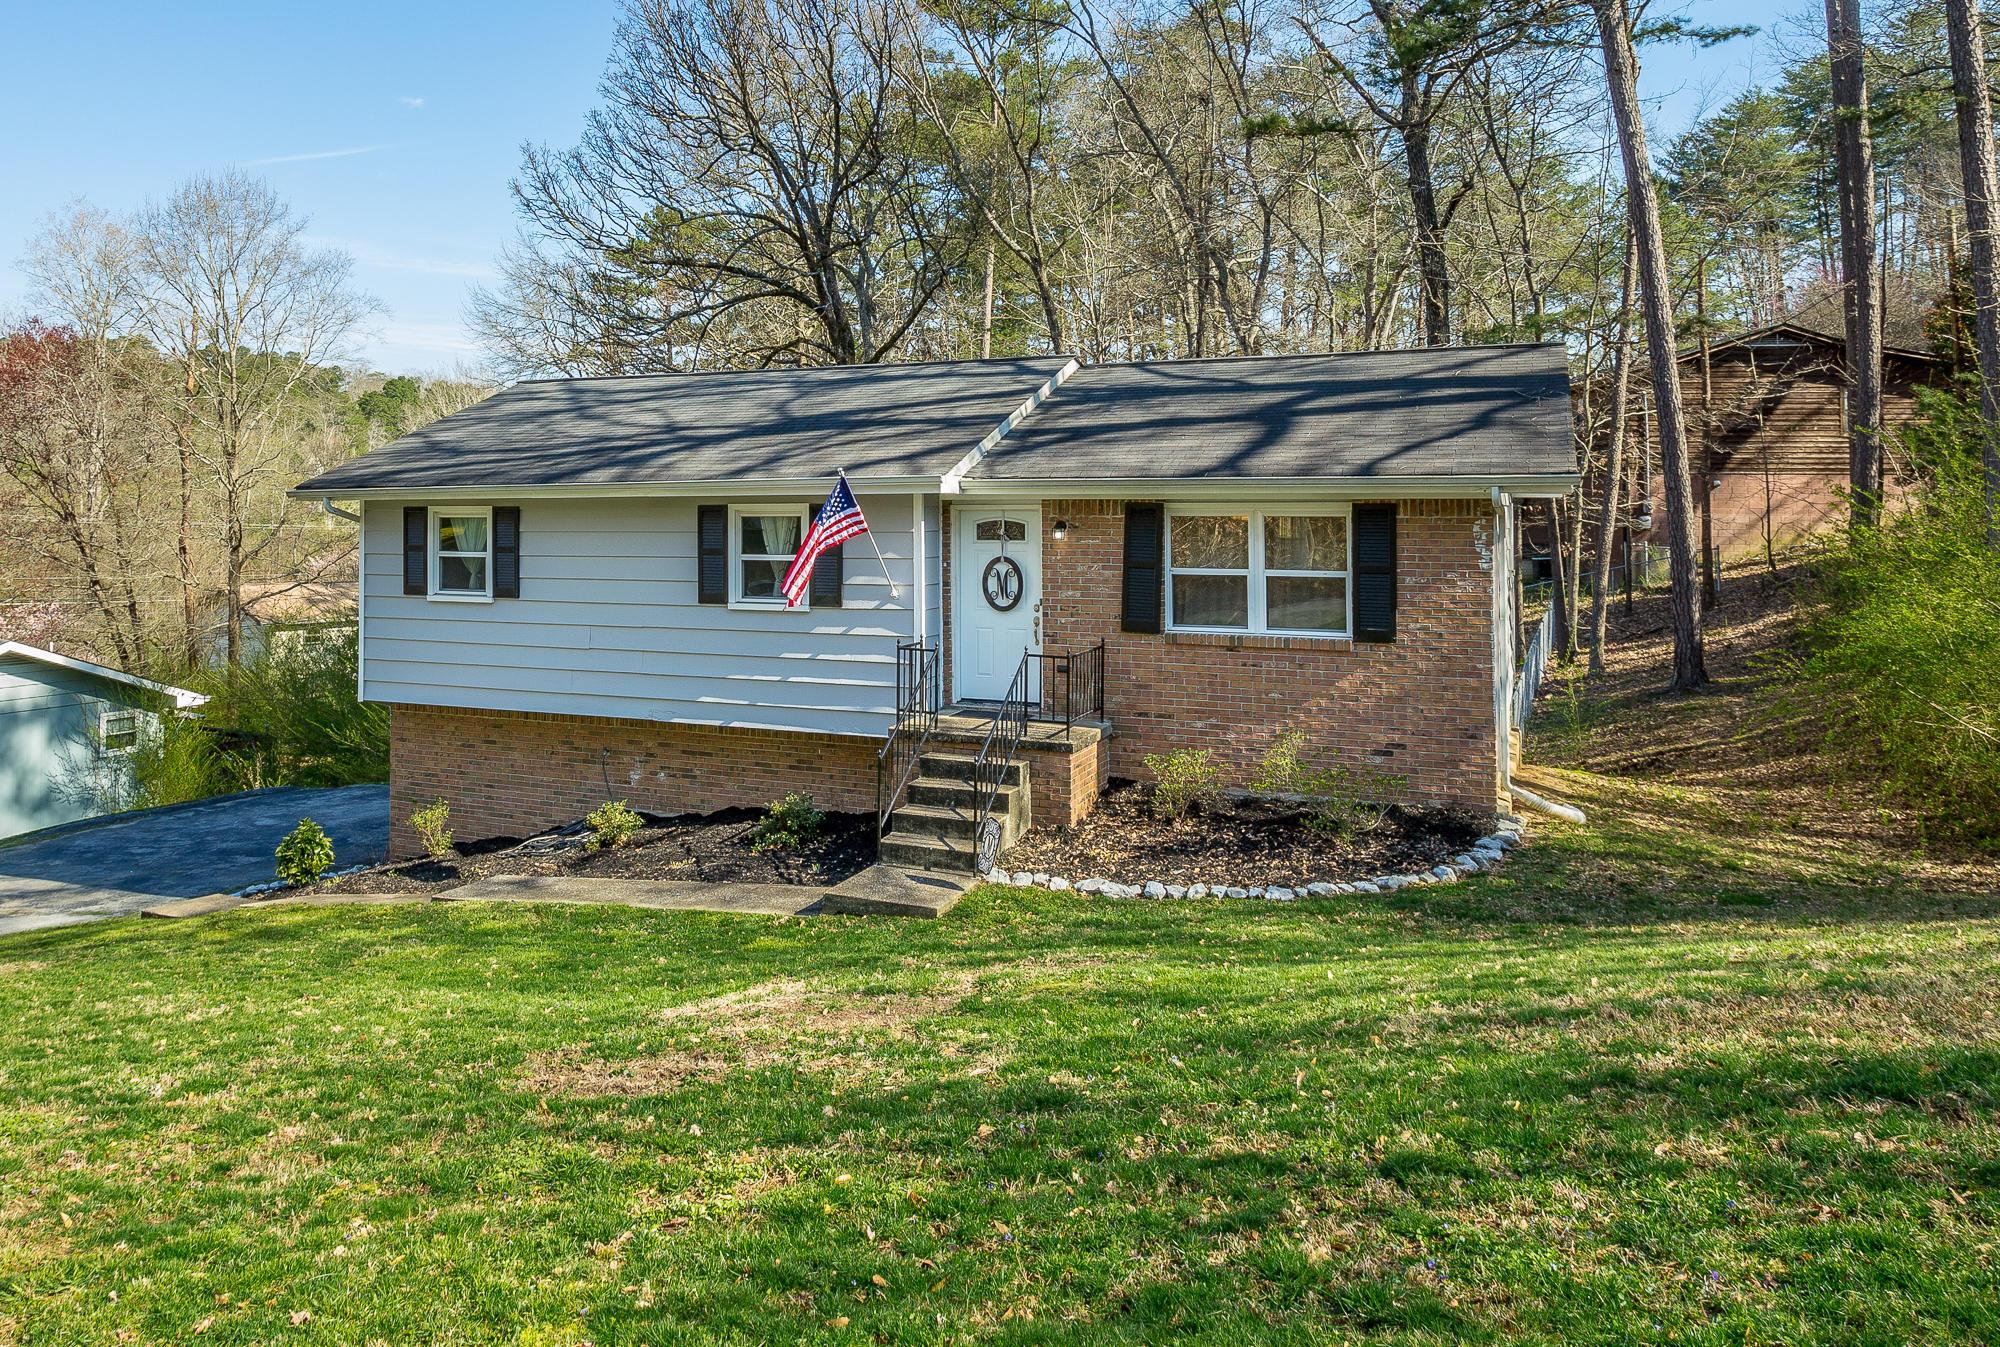 443 Brookmont Ln, Hixson, TN 37343